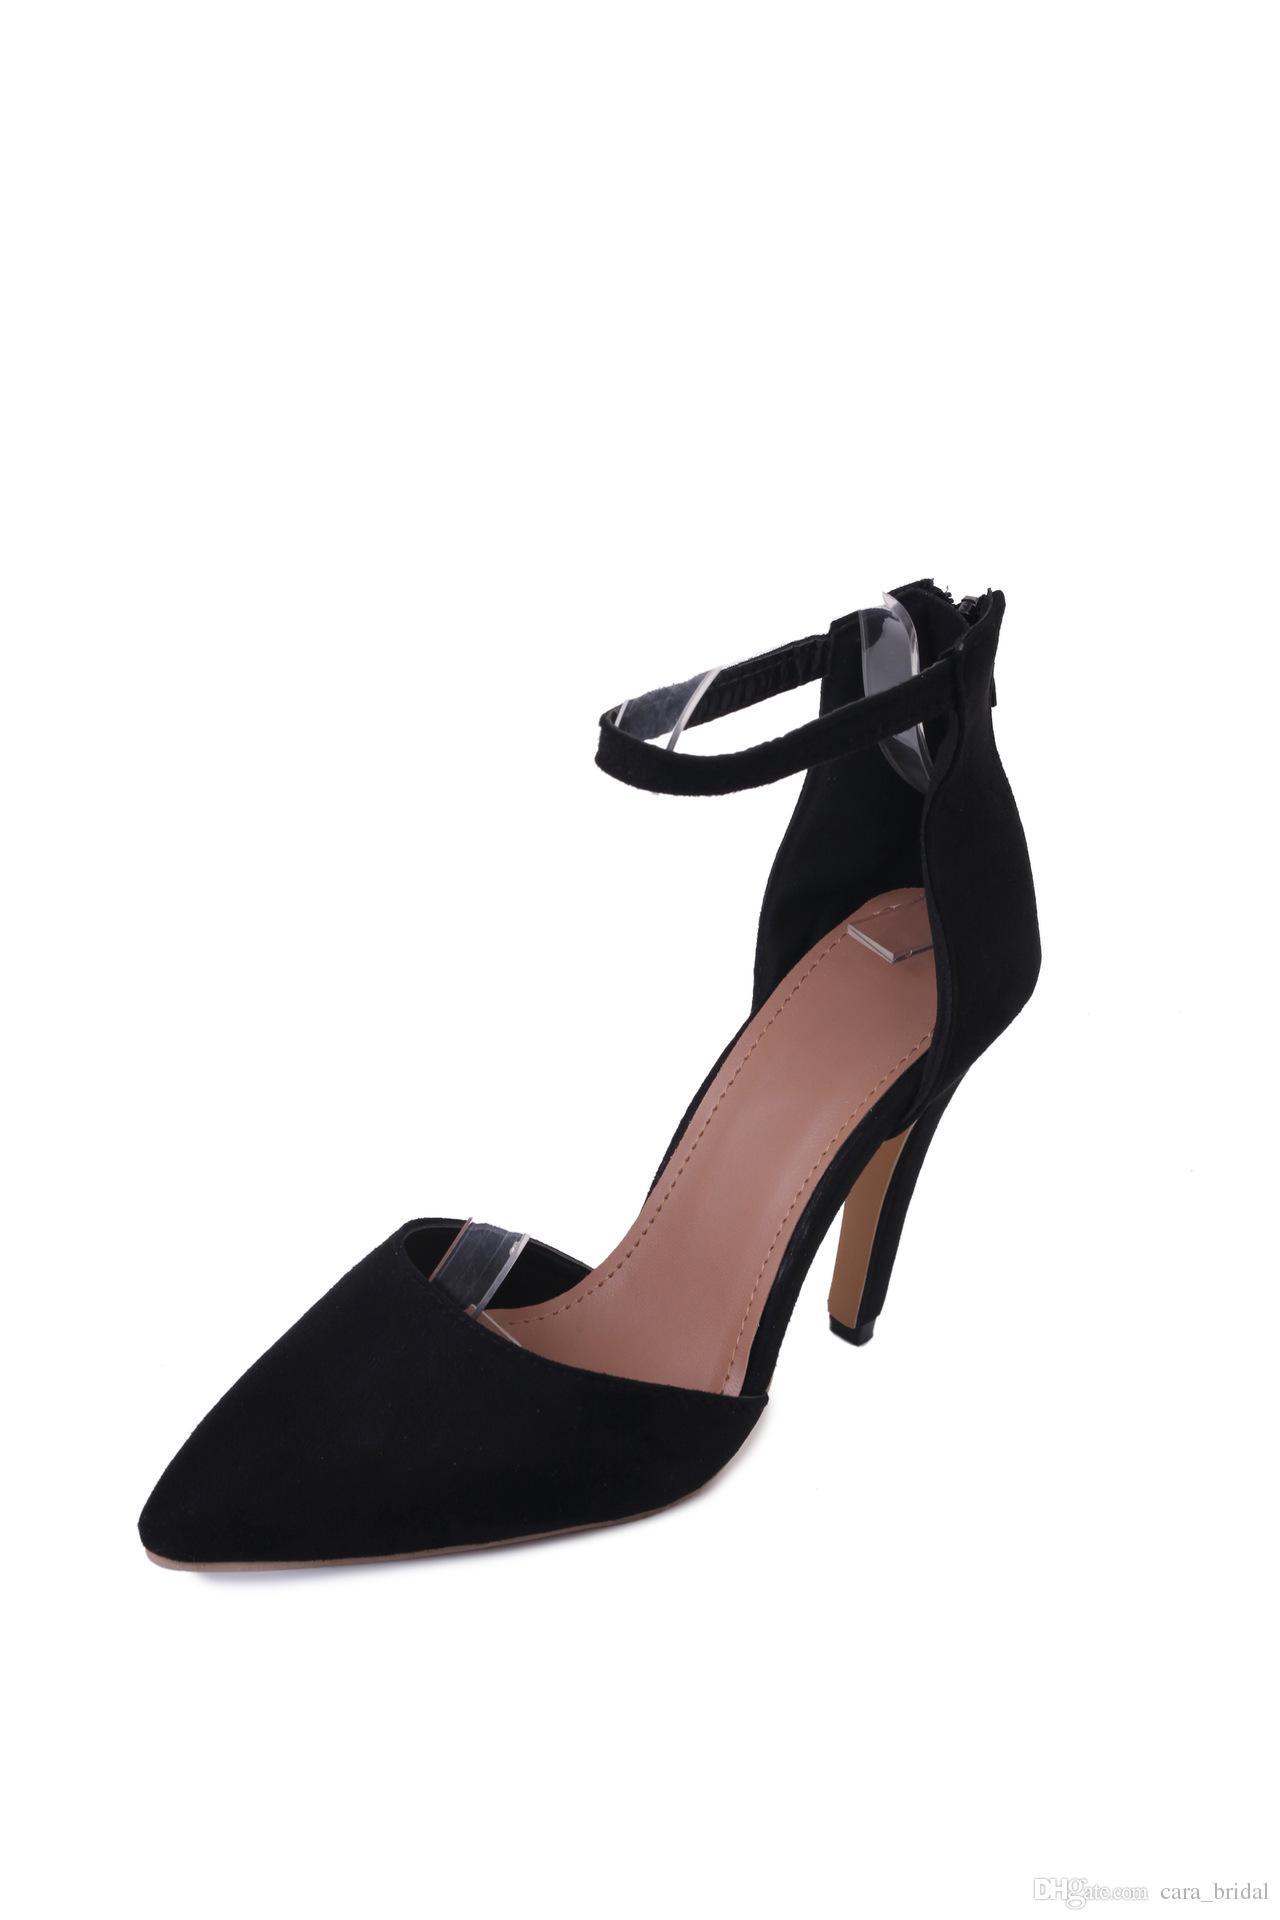 360c7b1d6 ... Classic Black Velvet High Heels Women Pumps,Luxury Red Bottom Pointy  Toes Dress Wedding Shoes ...